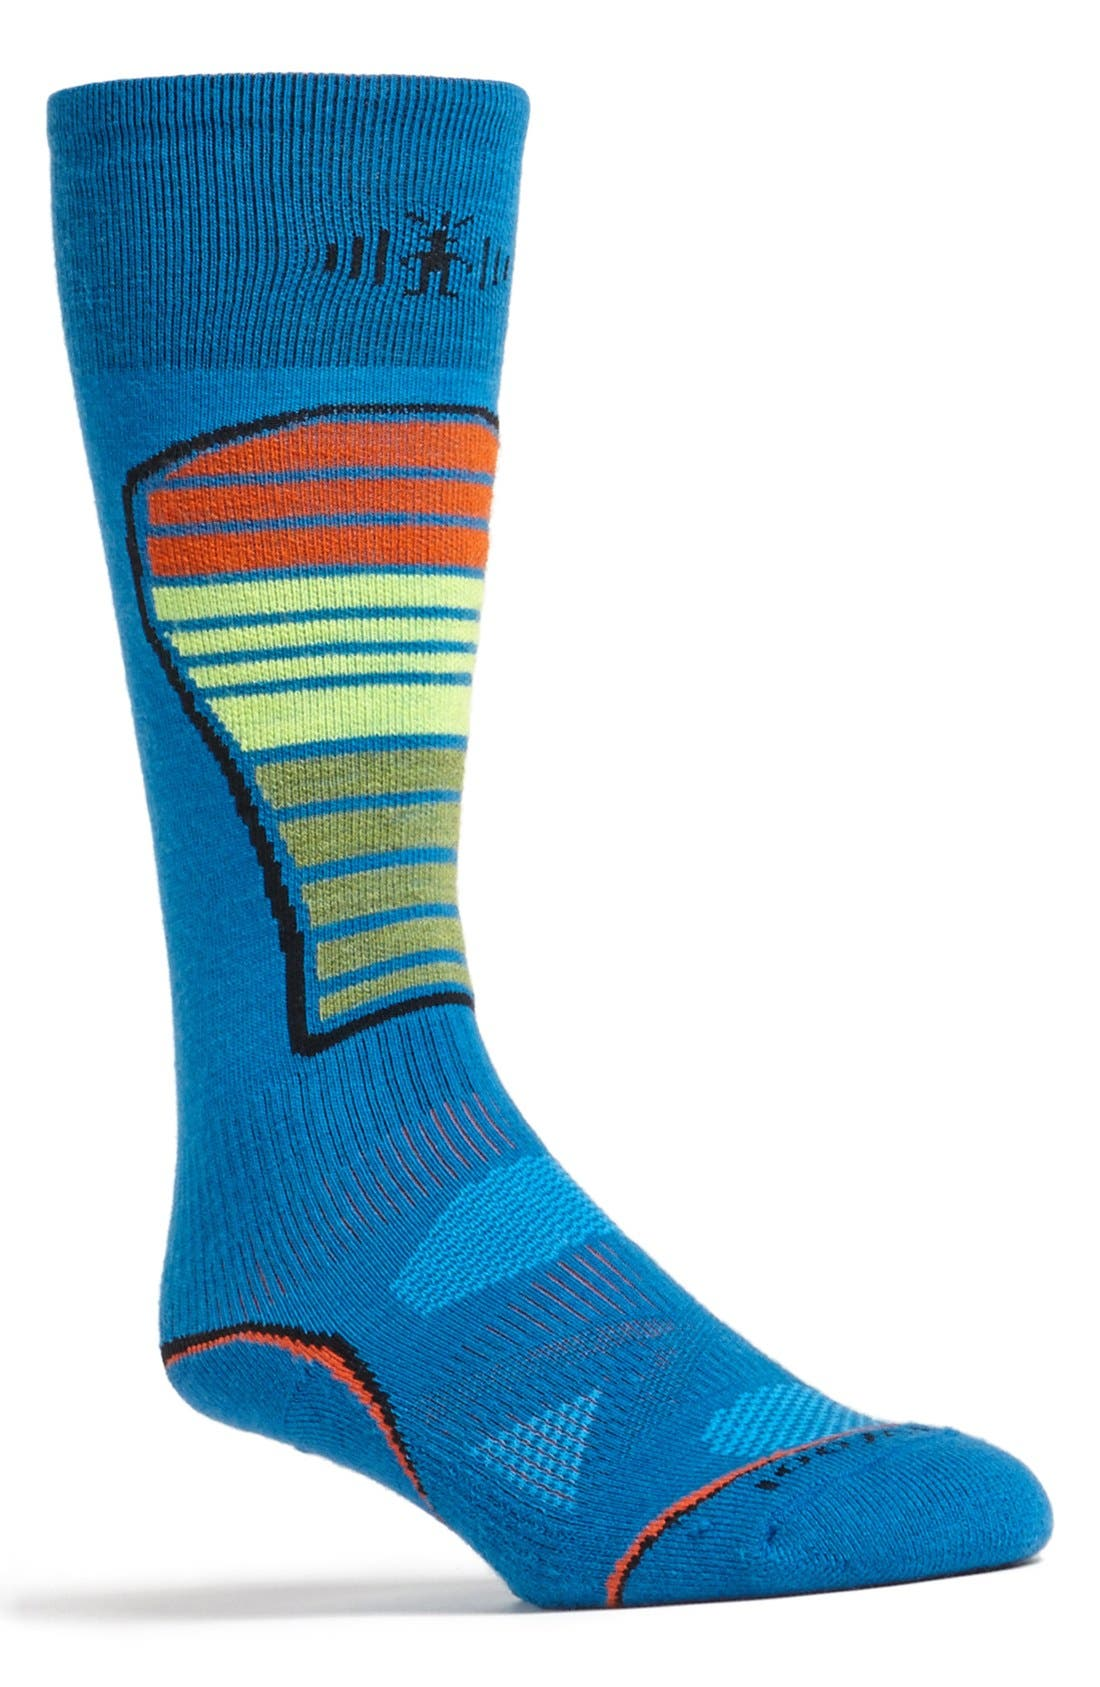 Main Image - Smartwool 'PhD - Light' Ski Socks